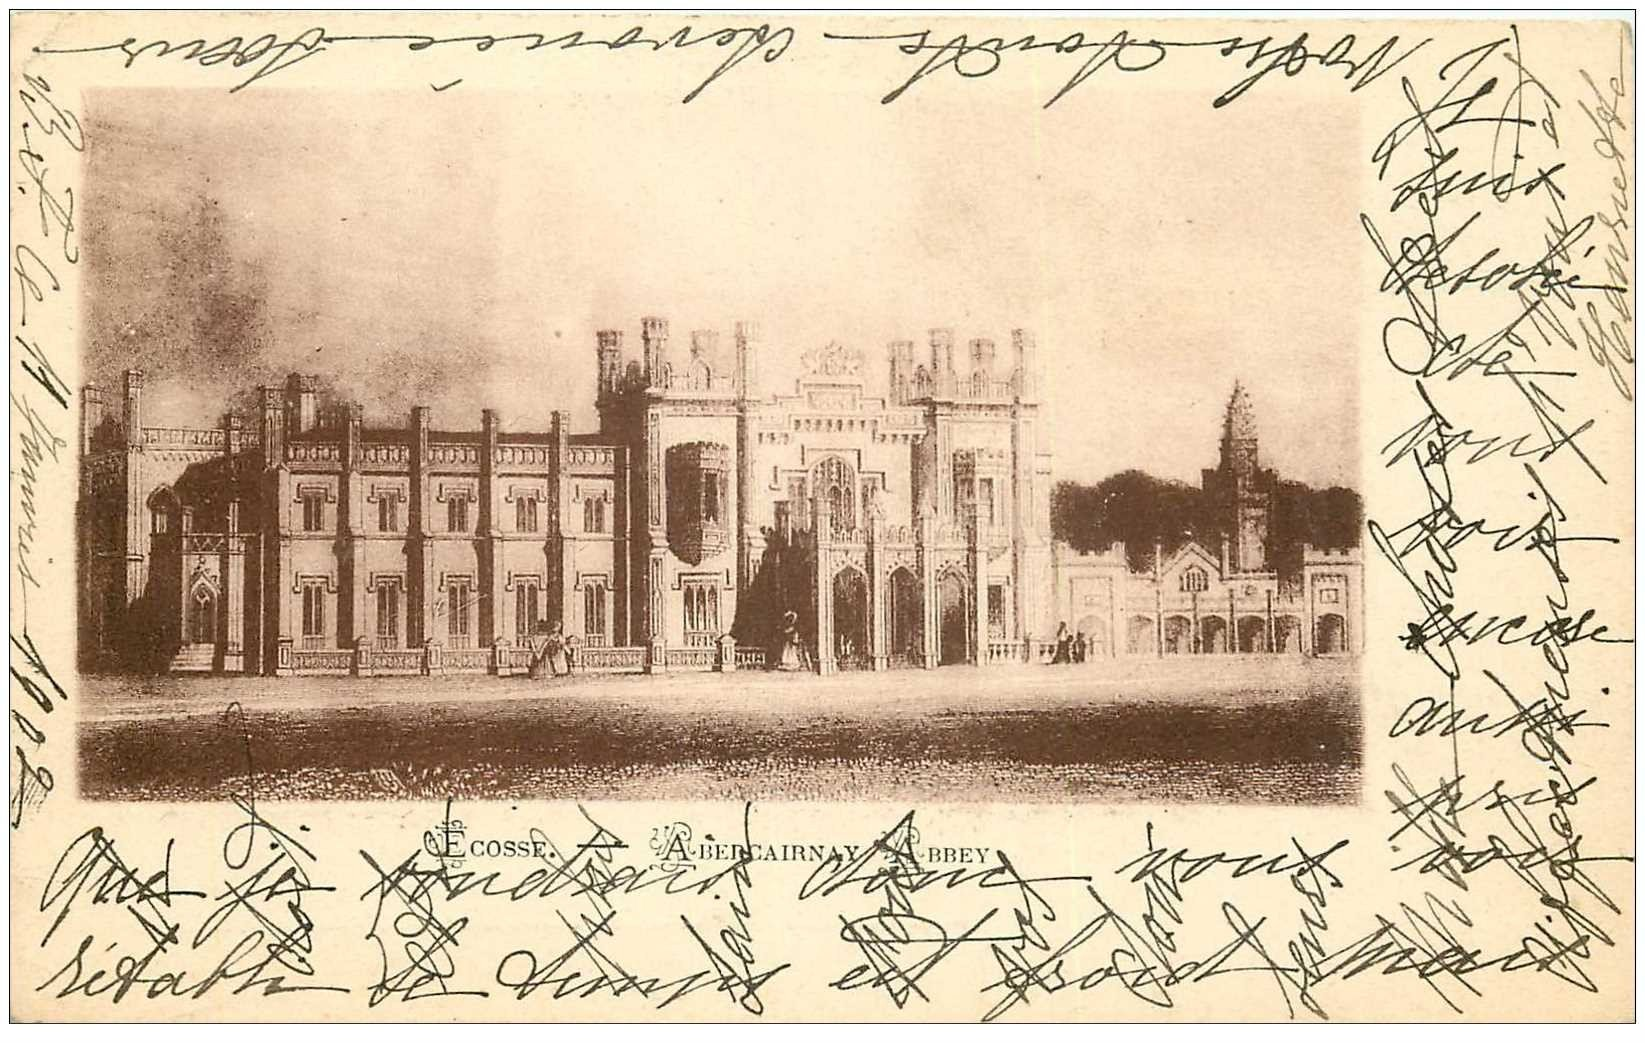 carte postale ancienne ENGLAND. Ecosse Abercairnay Abbey 1902